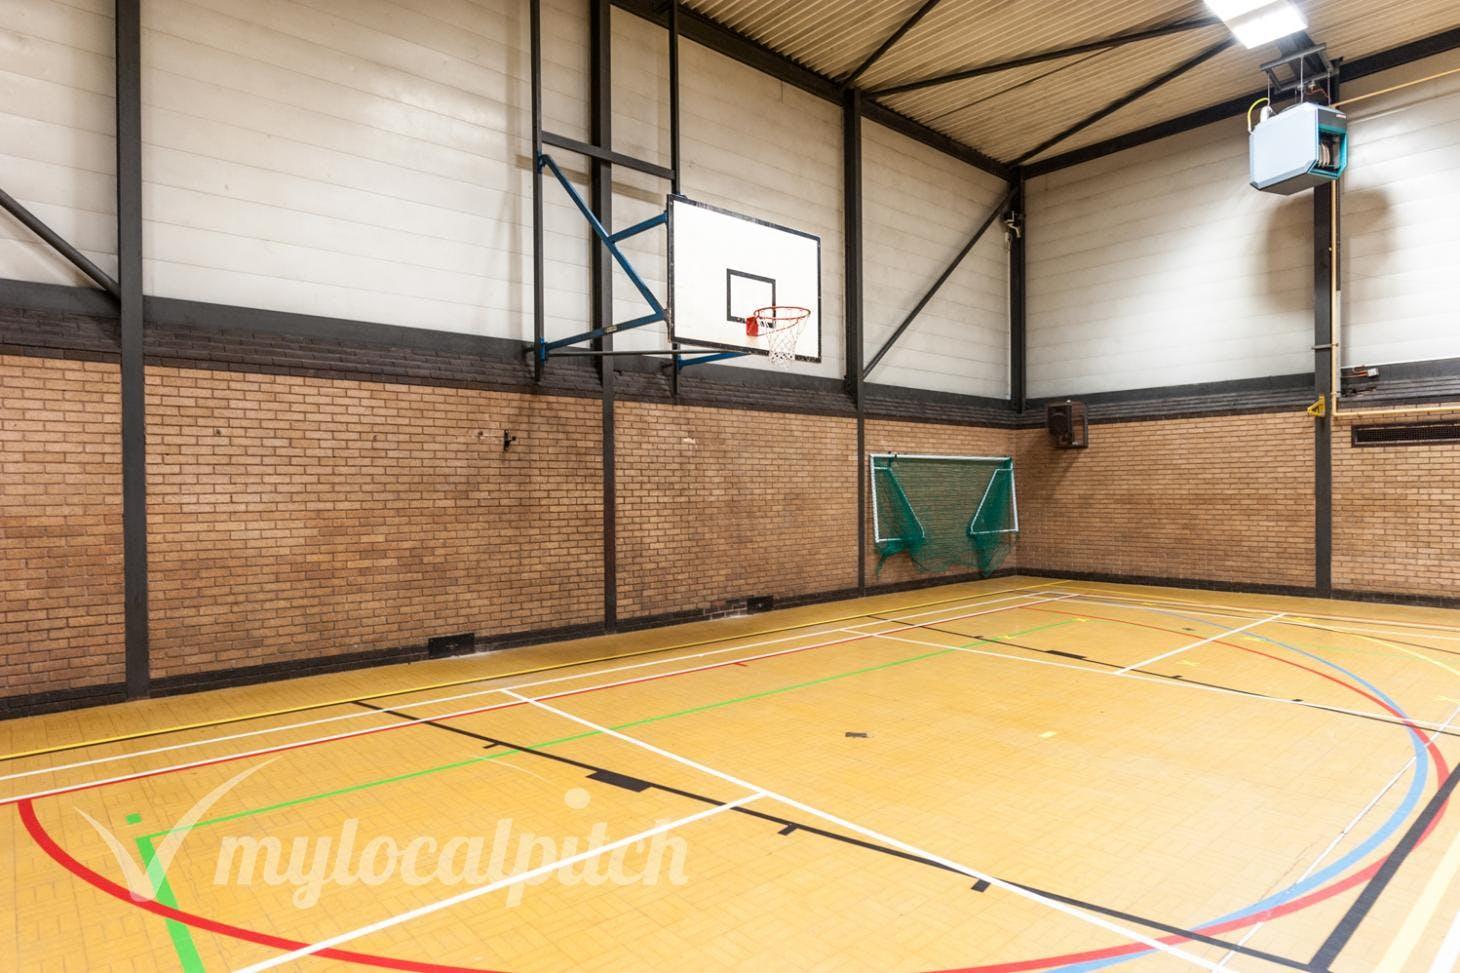 Clarendon Leisure Centre Indoor basketball court